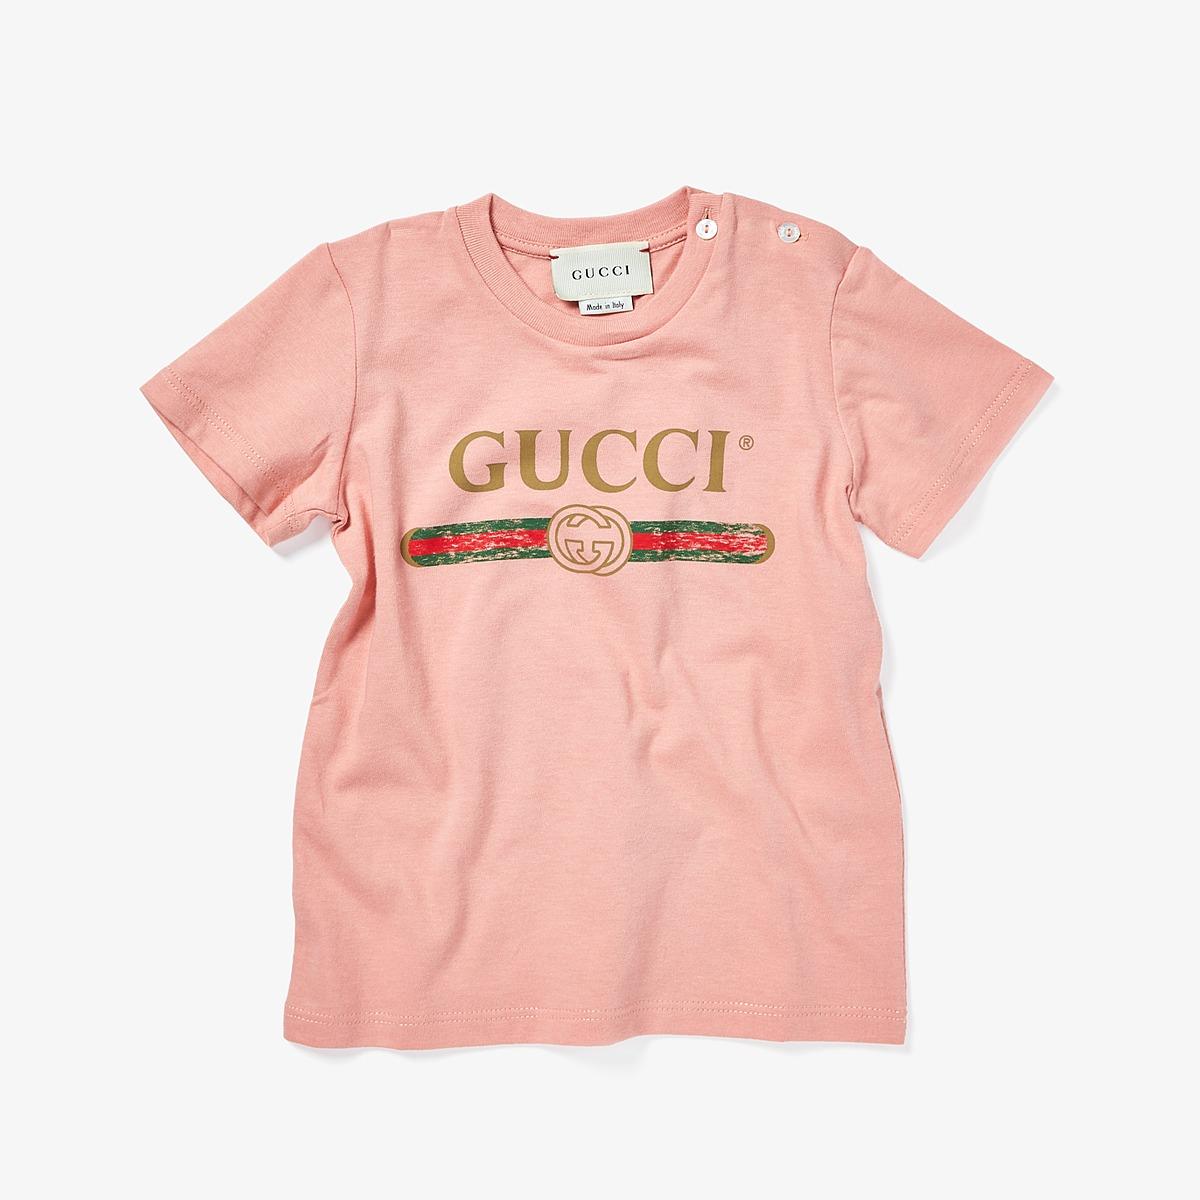 Gucci Kids - T-Shirt 504121X3L64 (Infant) (Rosantico/Green/Red) Kids T Shirt